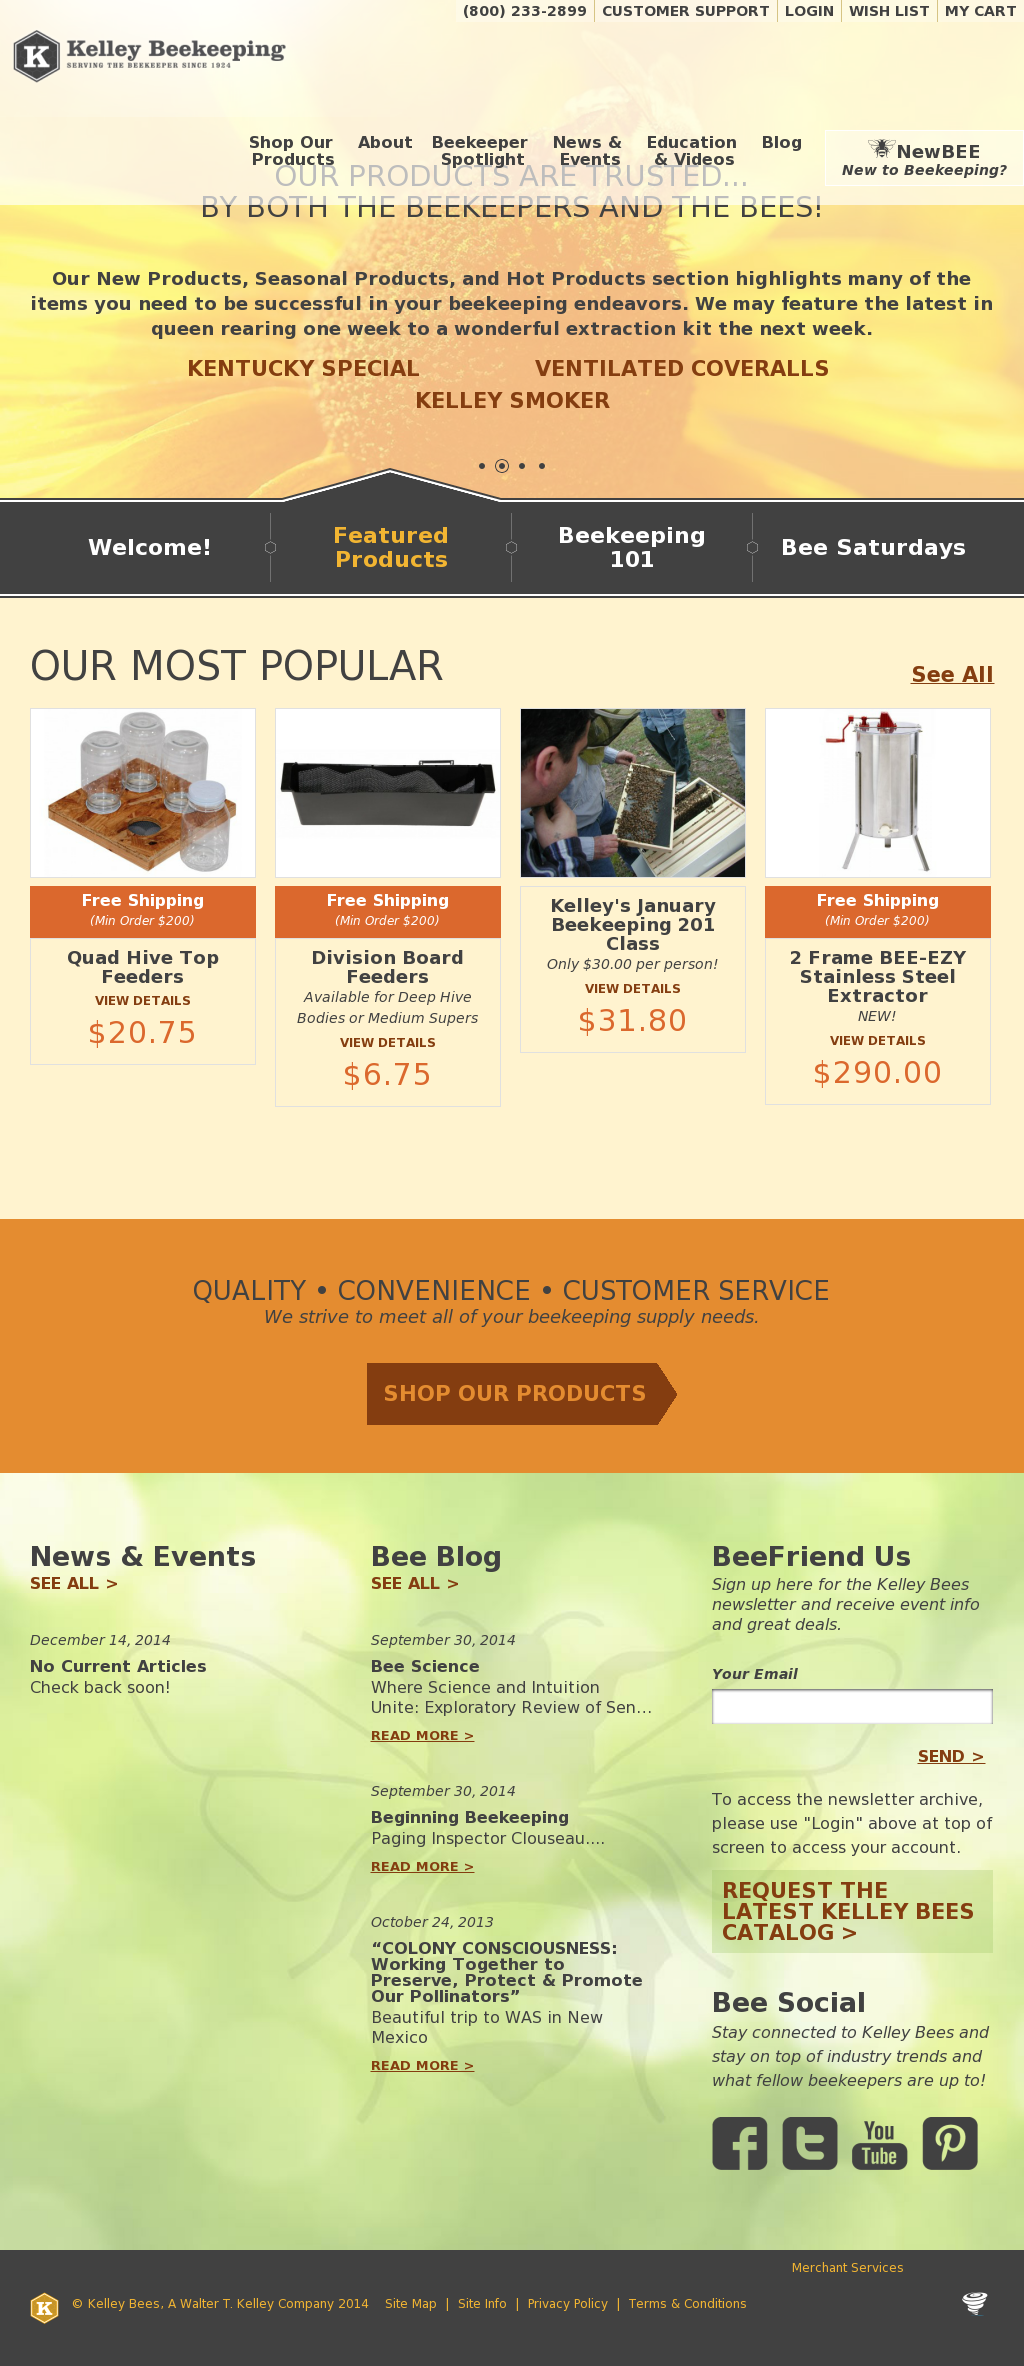 Kelley Beekeeping Competitors, Revenue and Employees - Owler